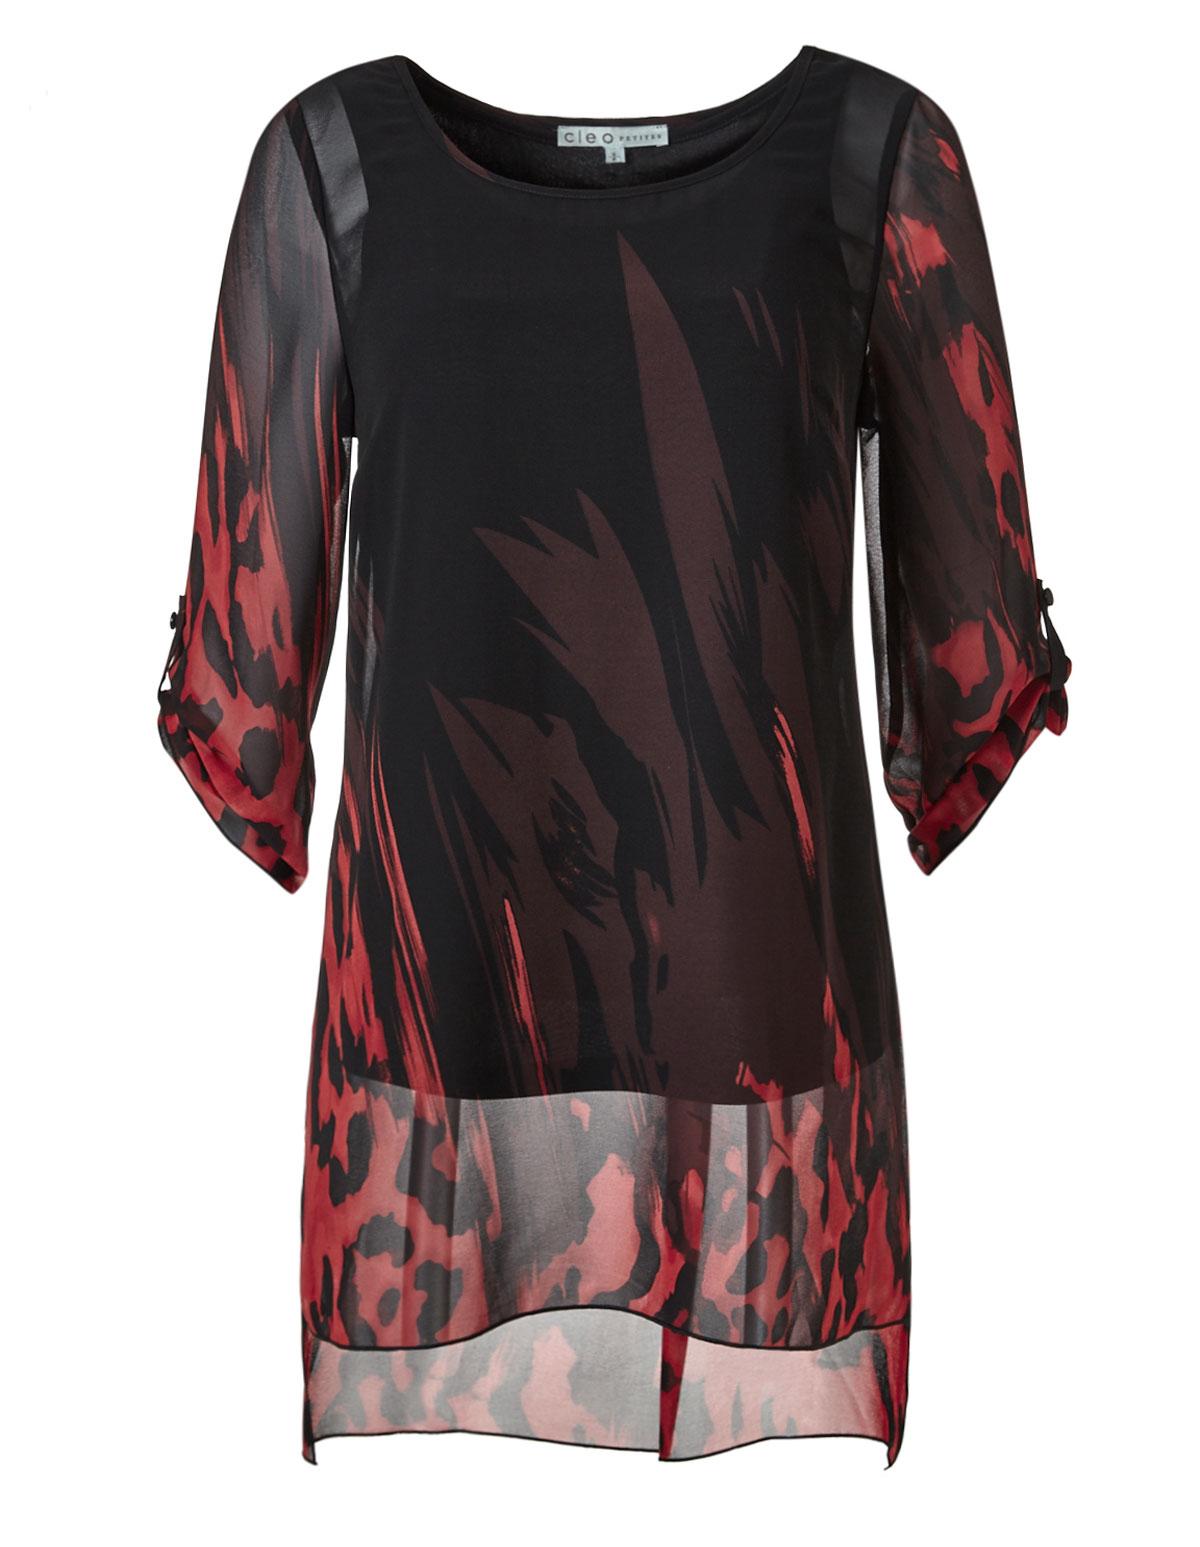 98d556fca1e2a Black Printed Tunic Blouse